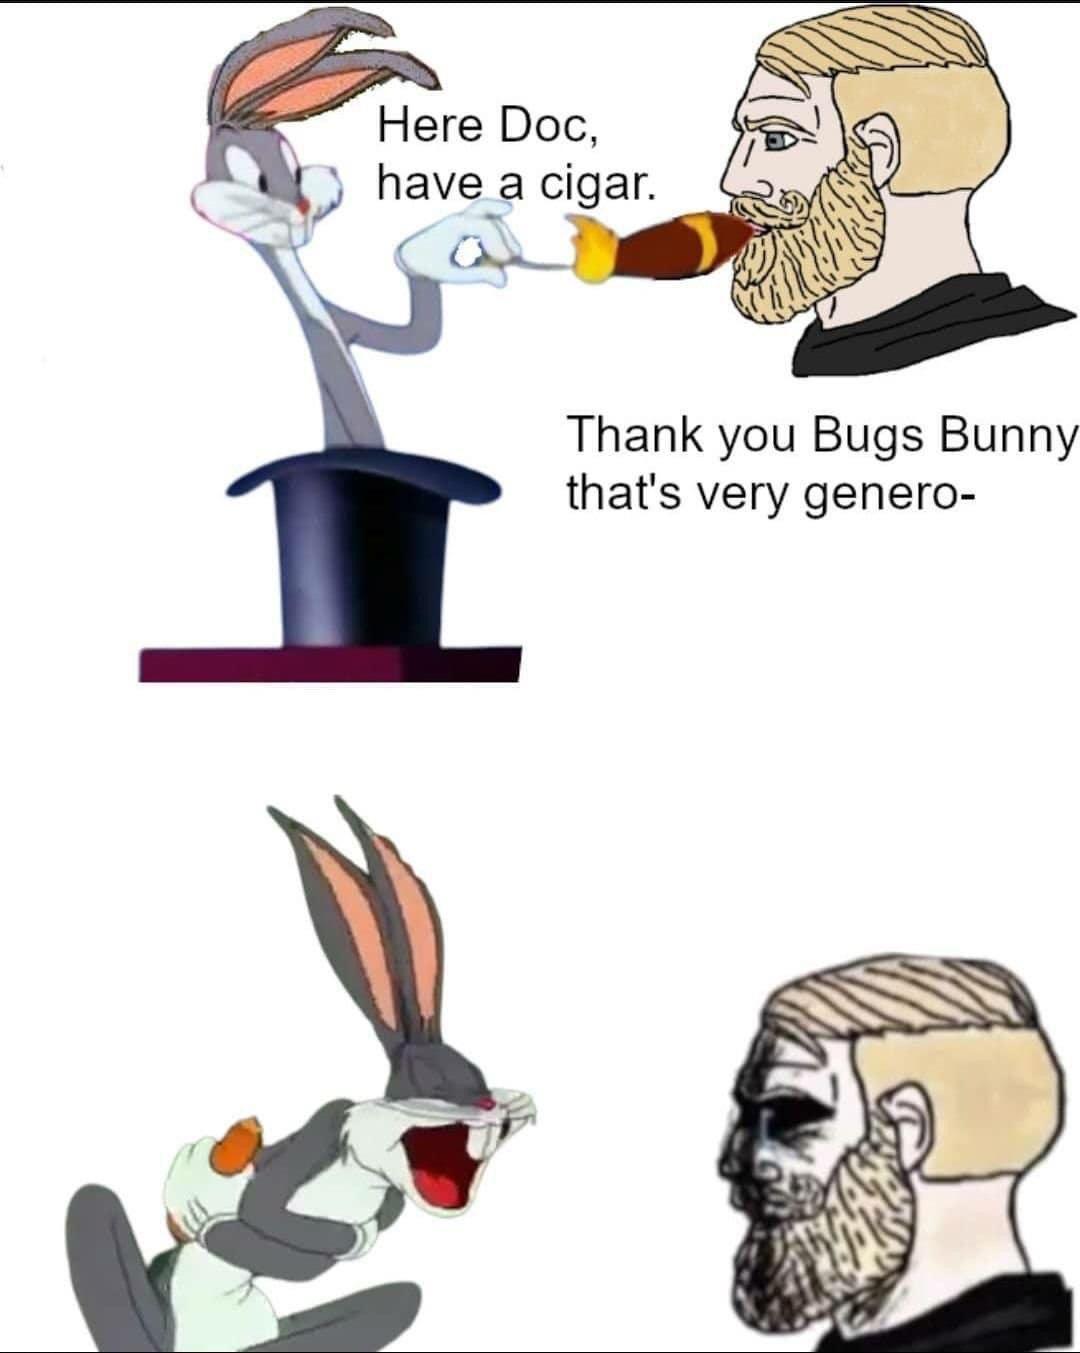 Rabbit is back on the menu, boys